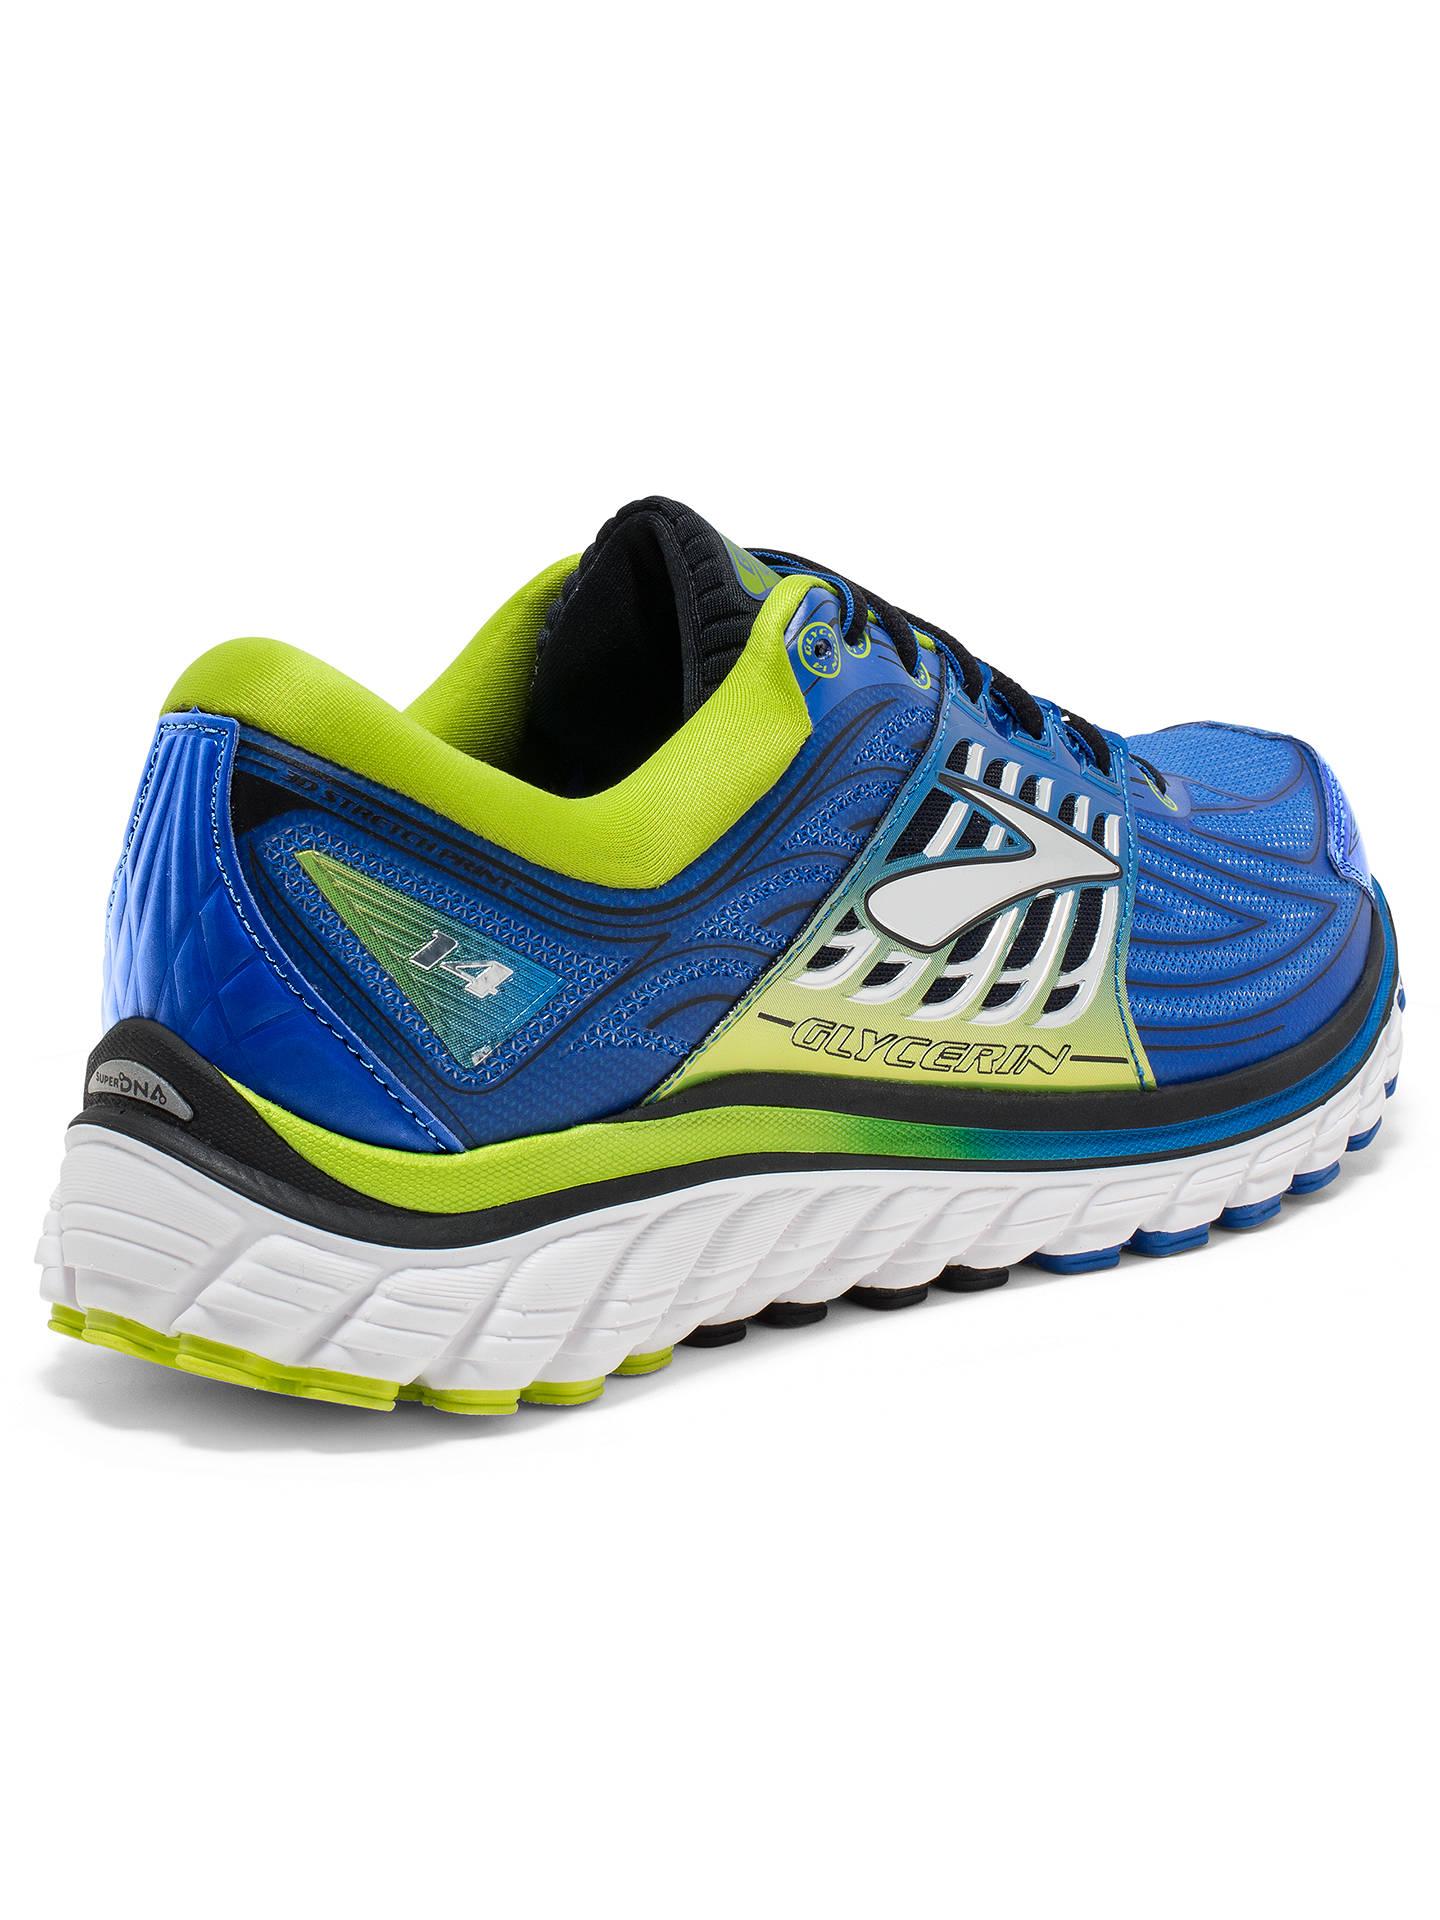 4c5b98f2617 ... Buy Brooks Glycerin 14 Men s Running Shoes